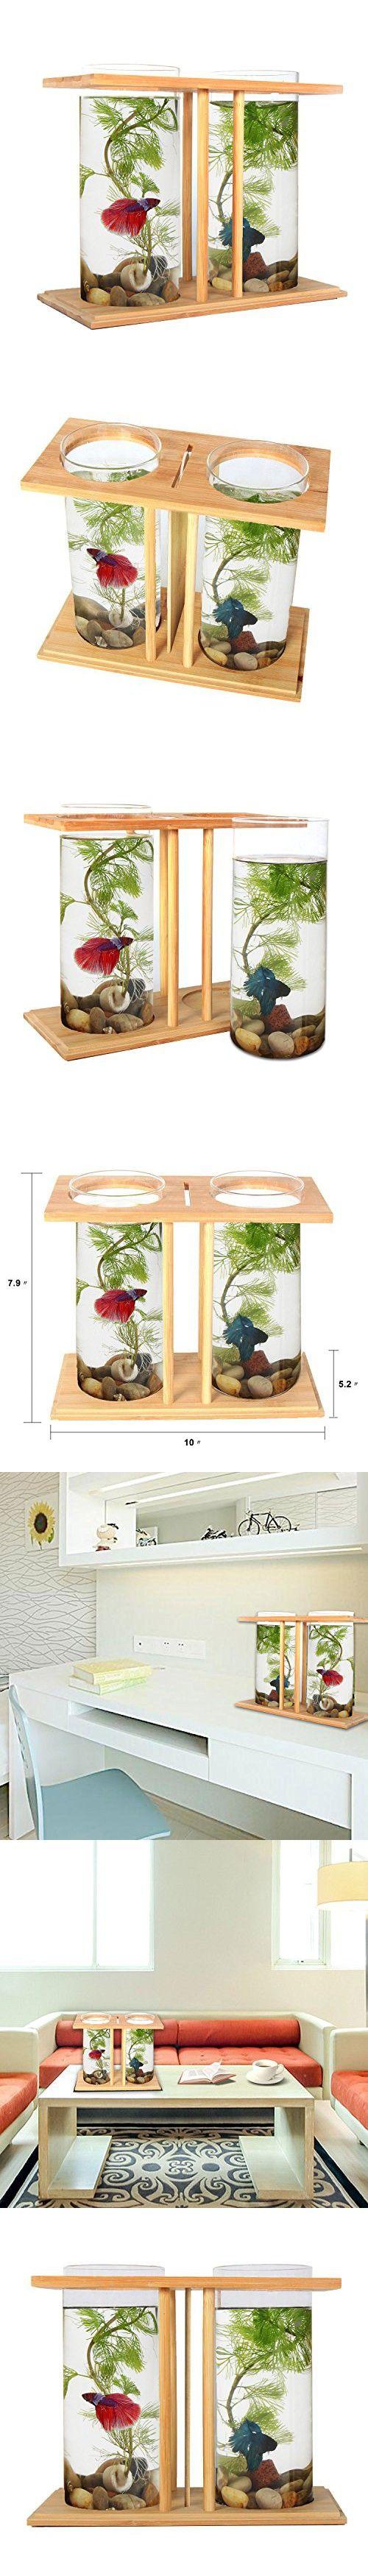 Fish tank aquarium castle hill - Fish Bowls Bamboo Segarty Unique Cool Design Small Square Glass Vase Creative Aquarium Kit With